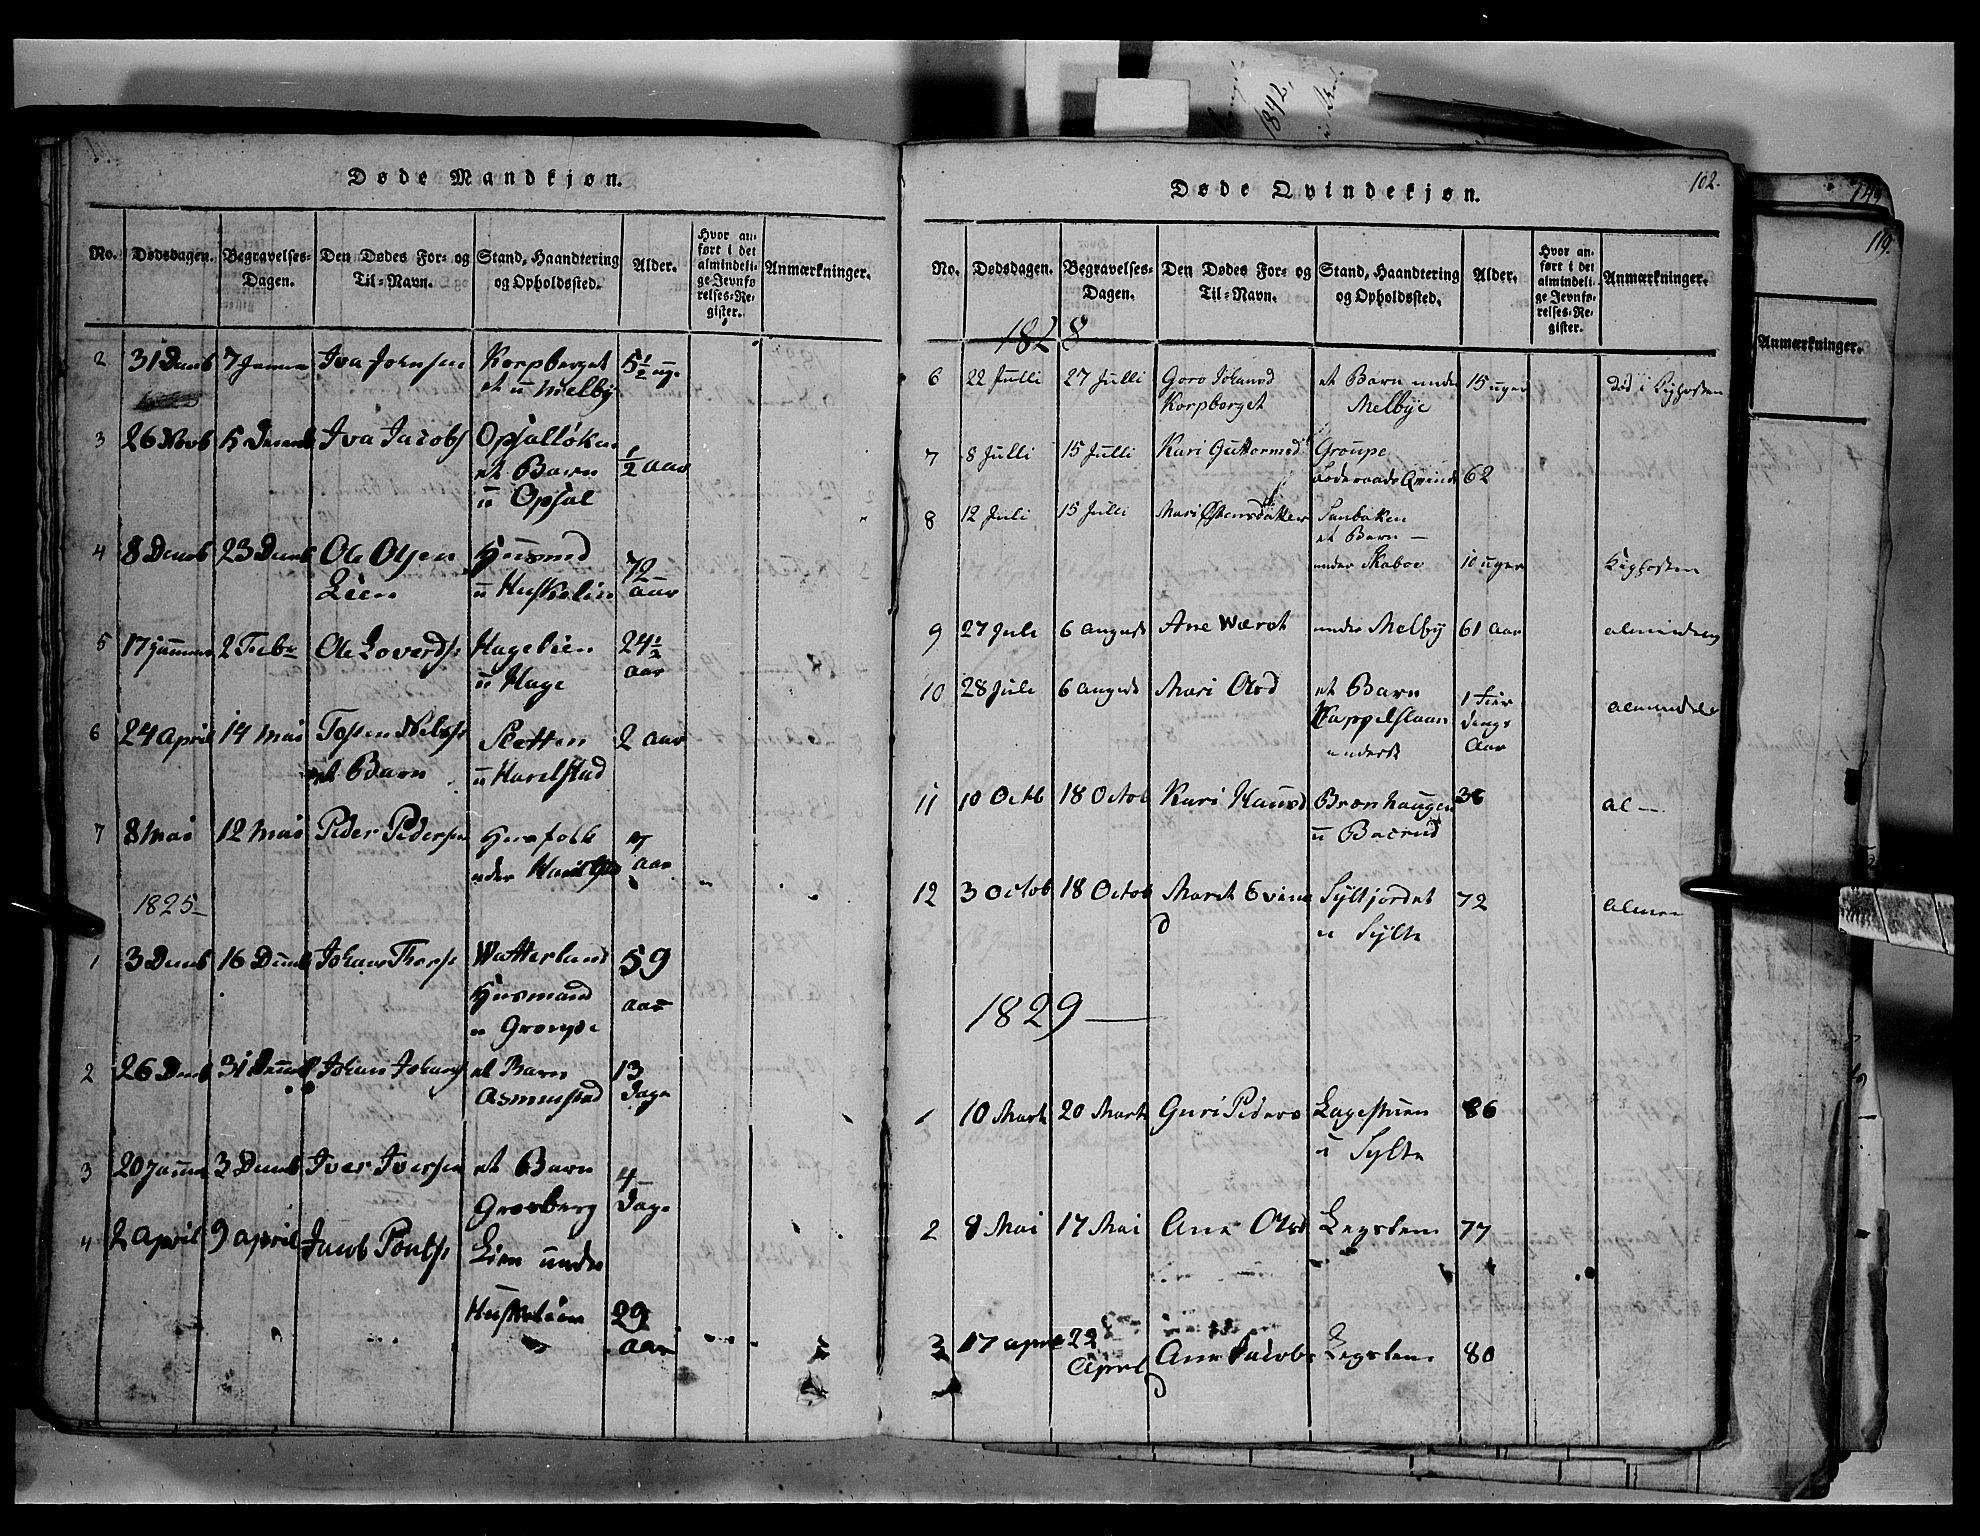 SAH, Fron prestekontor, H/Ha/Hab/L0003: Klokkerbok nr. 3, 1816-1850, s. 102